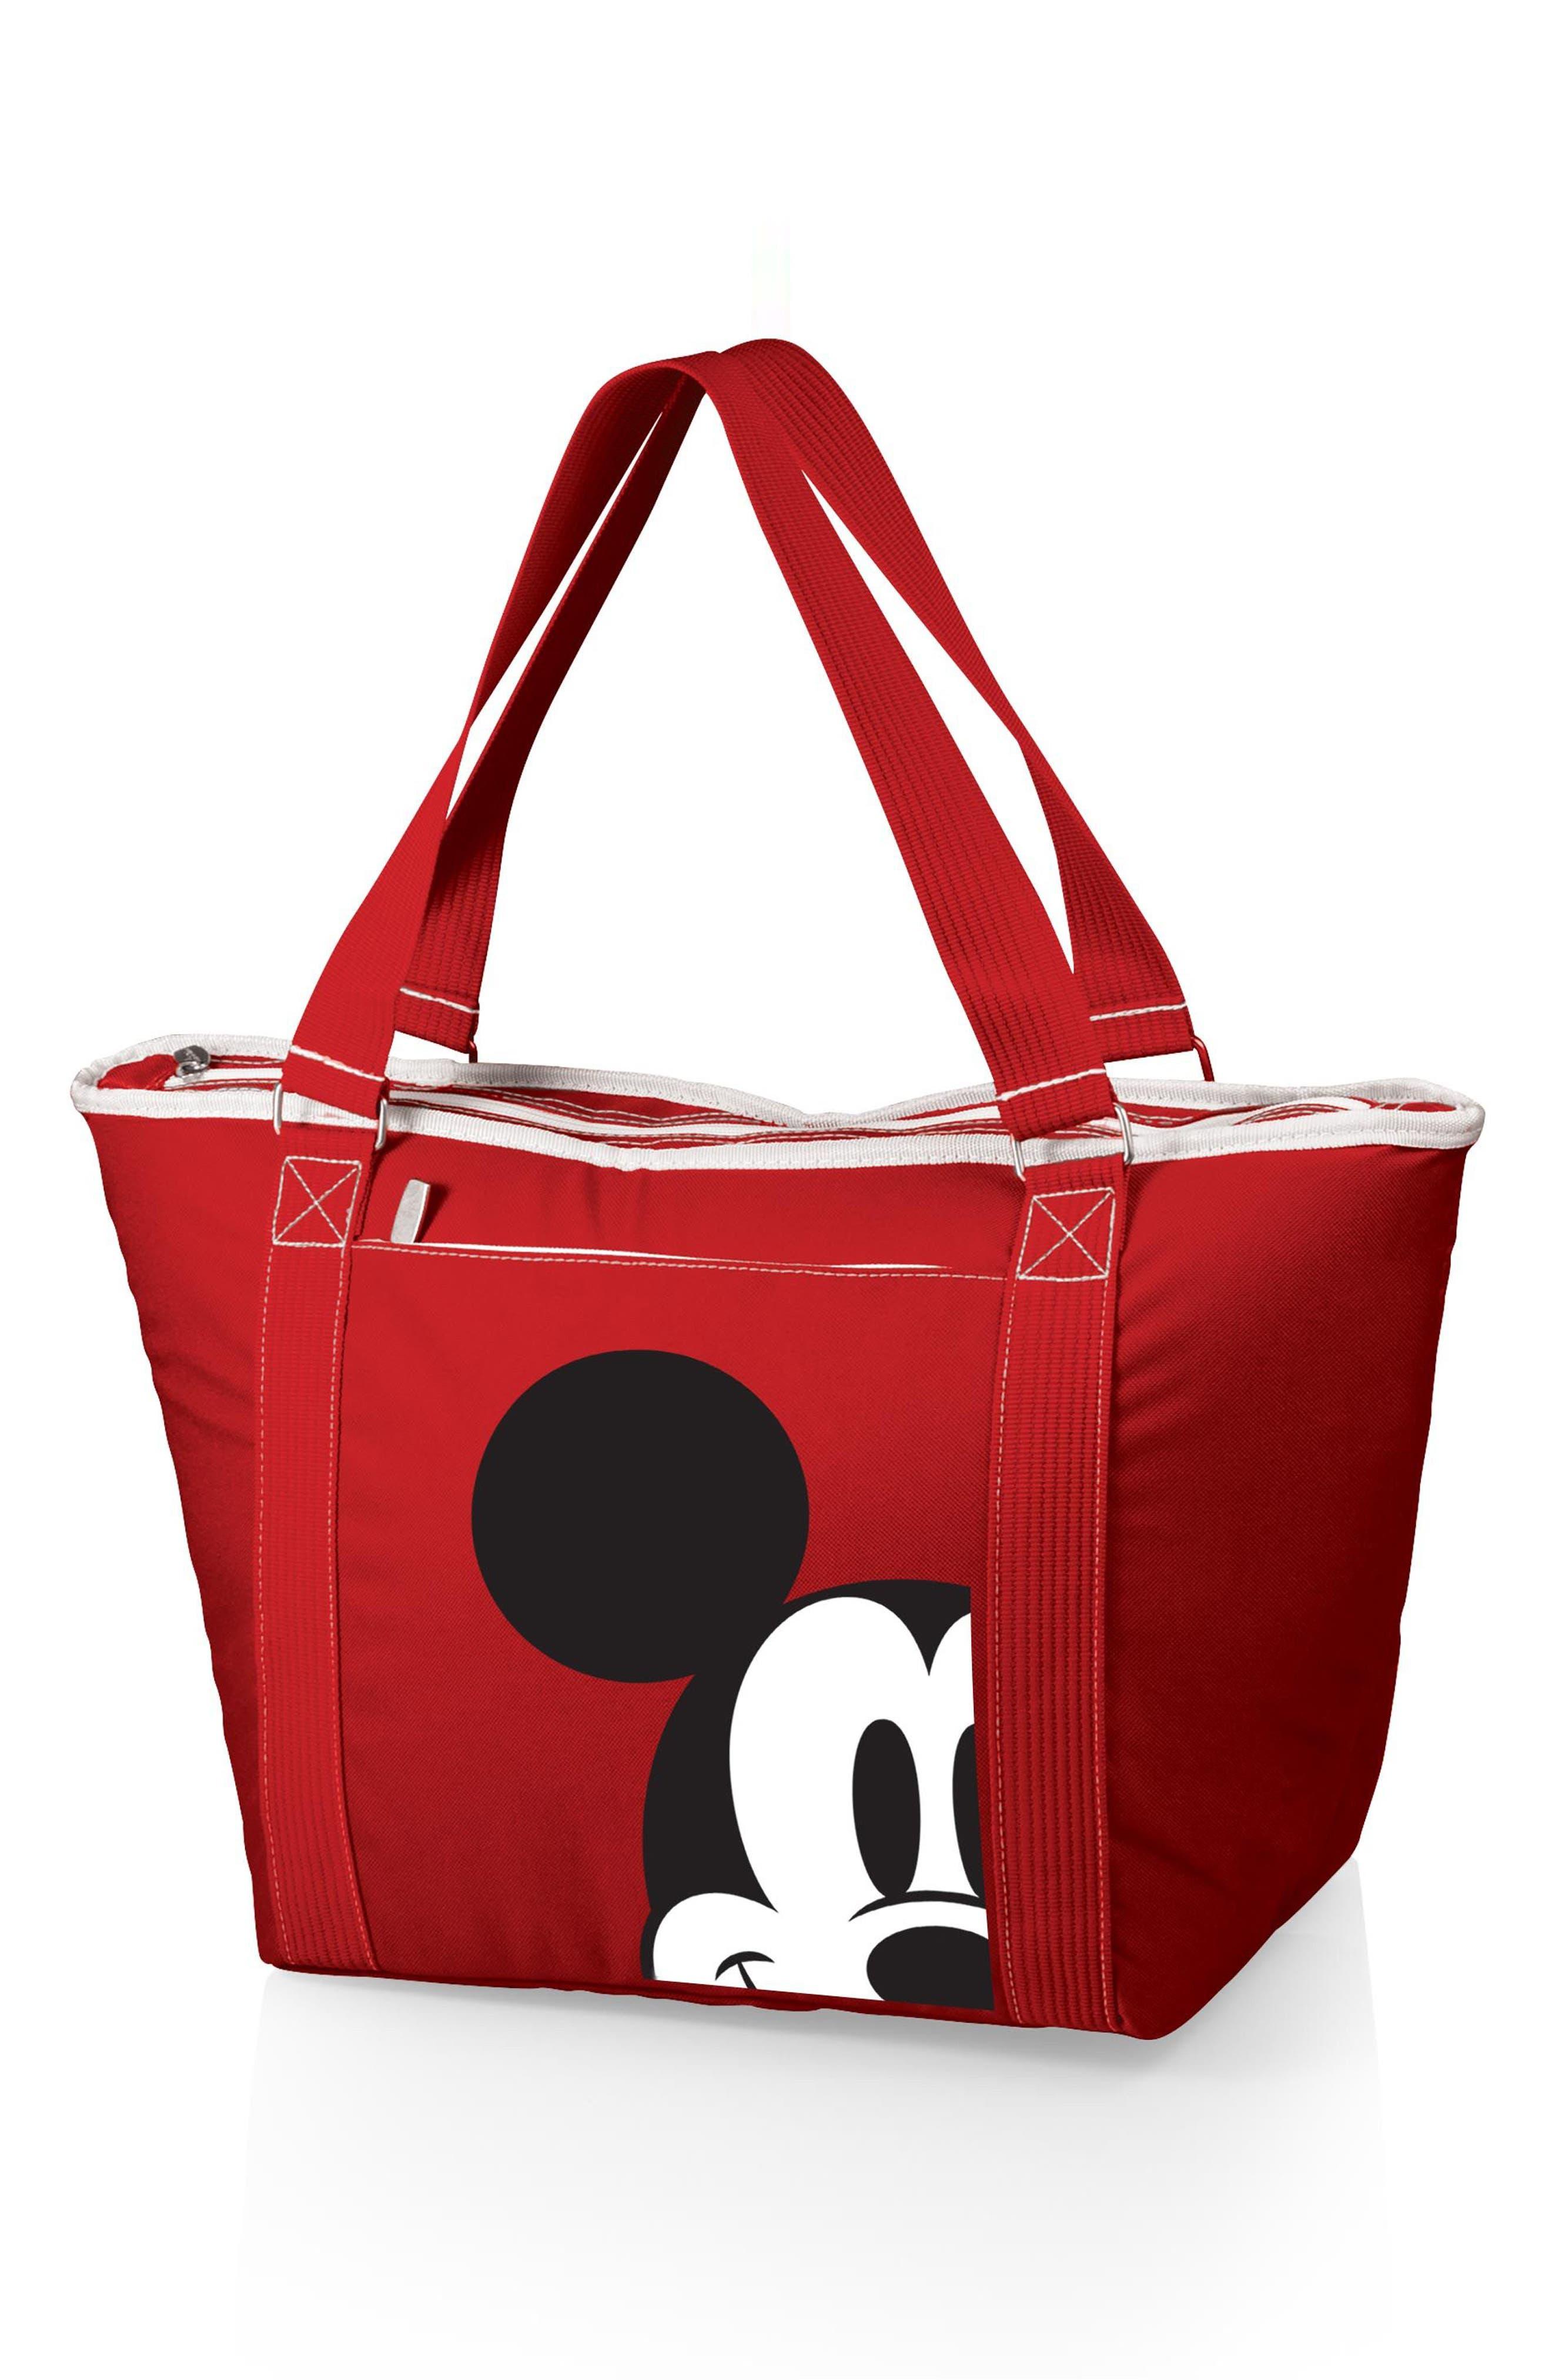 Disney<sup>®</sup> Mickey Mouse Topanga Cooler Tote,                             Main thumbnail 1, color,                             Mickey